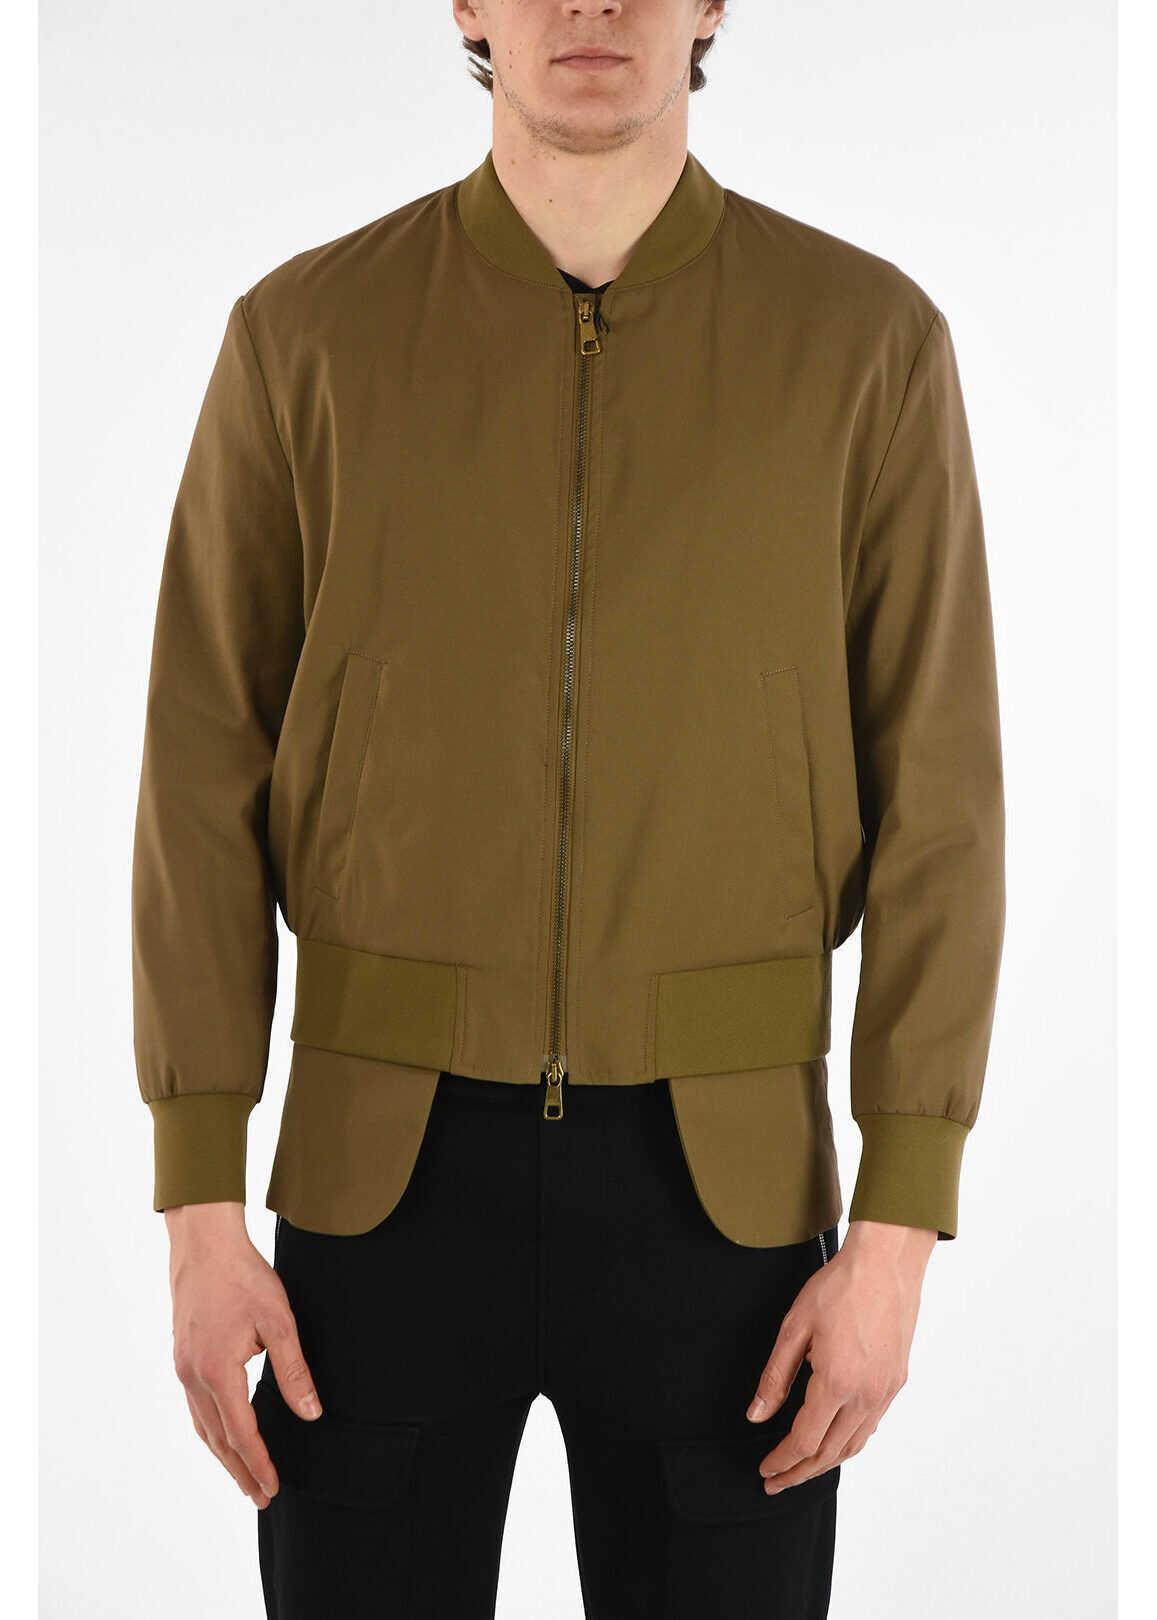 Neil Barrett Asymmetrical HYBRID Slim Fit Jacket BEIGE imagine